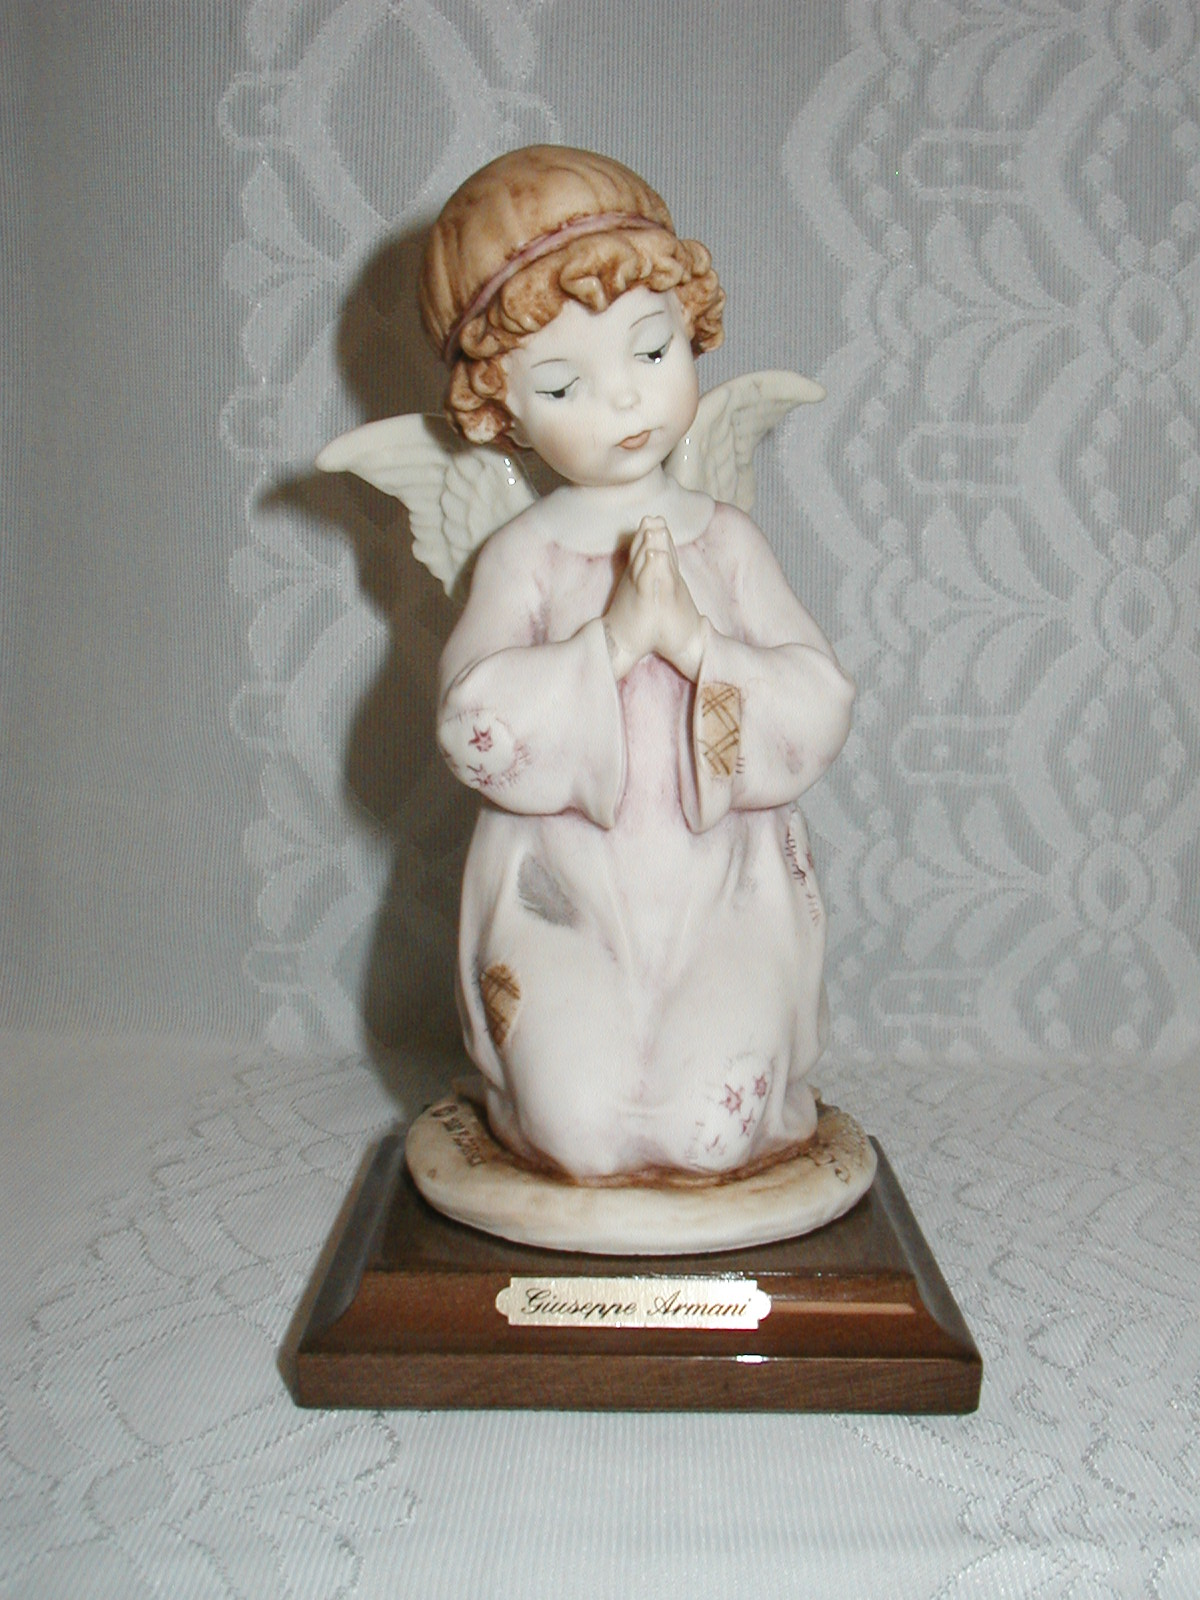 Armani Figurines Collection For Sale 23 Giuseppe Armani Porcelain Figurines Sale